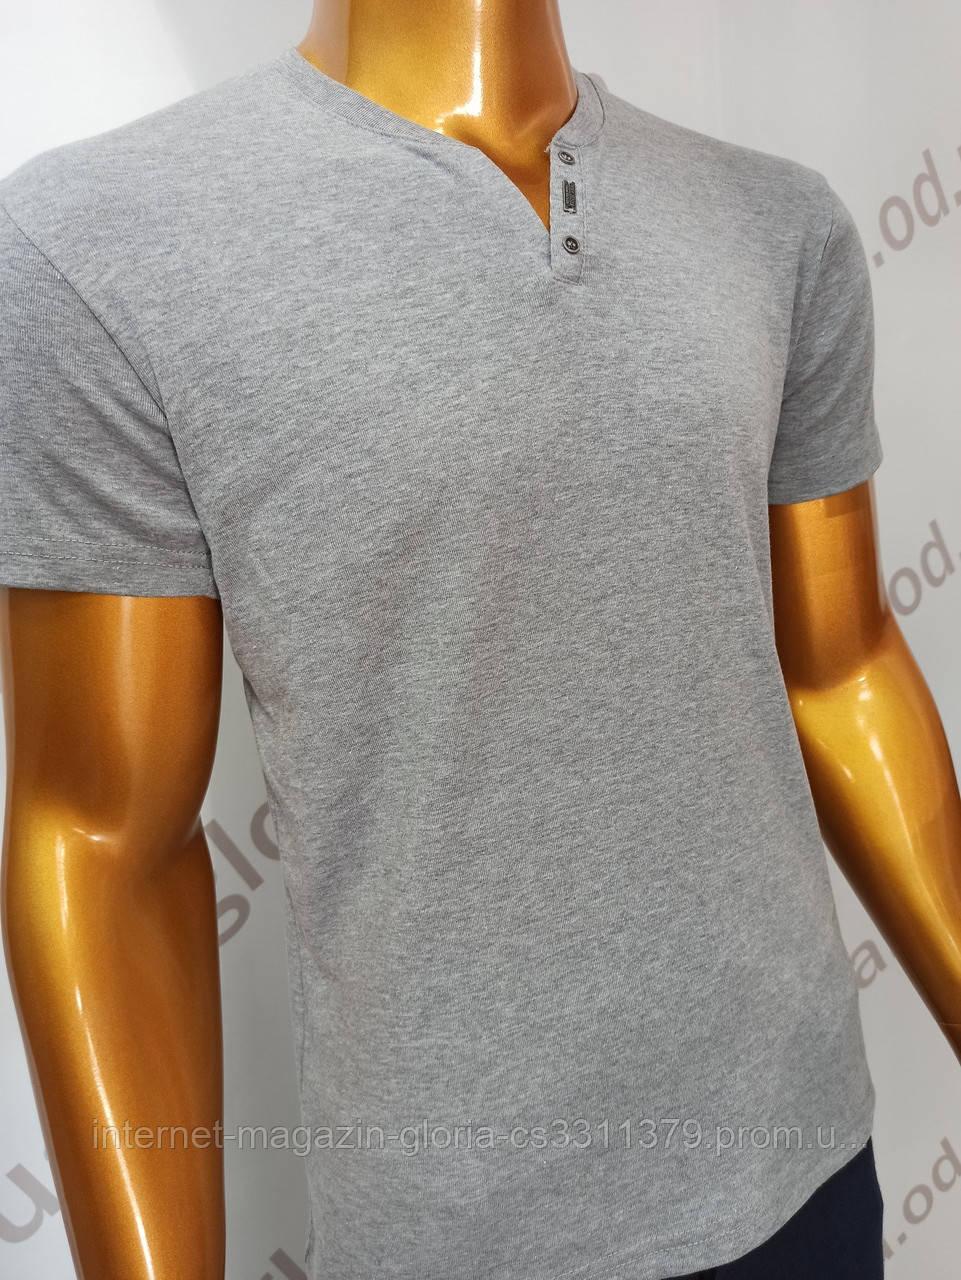 Мужская футболка MSY. 23214-8196(s). Размеры: M,L,XL,XXL.